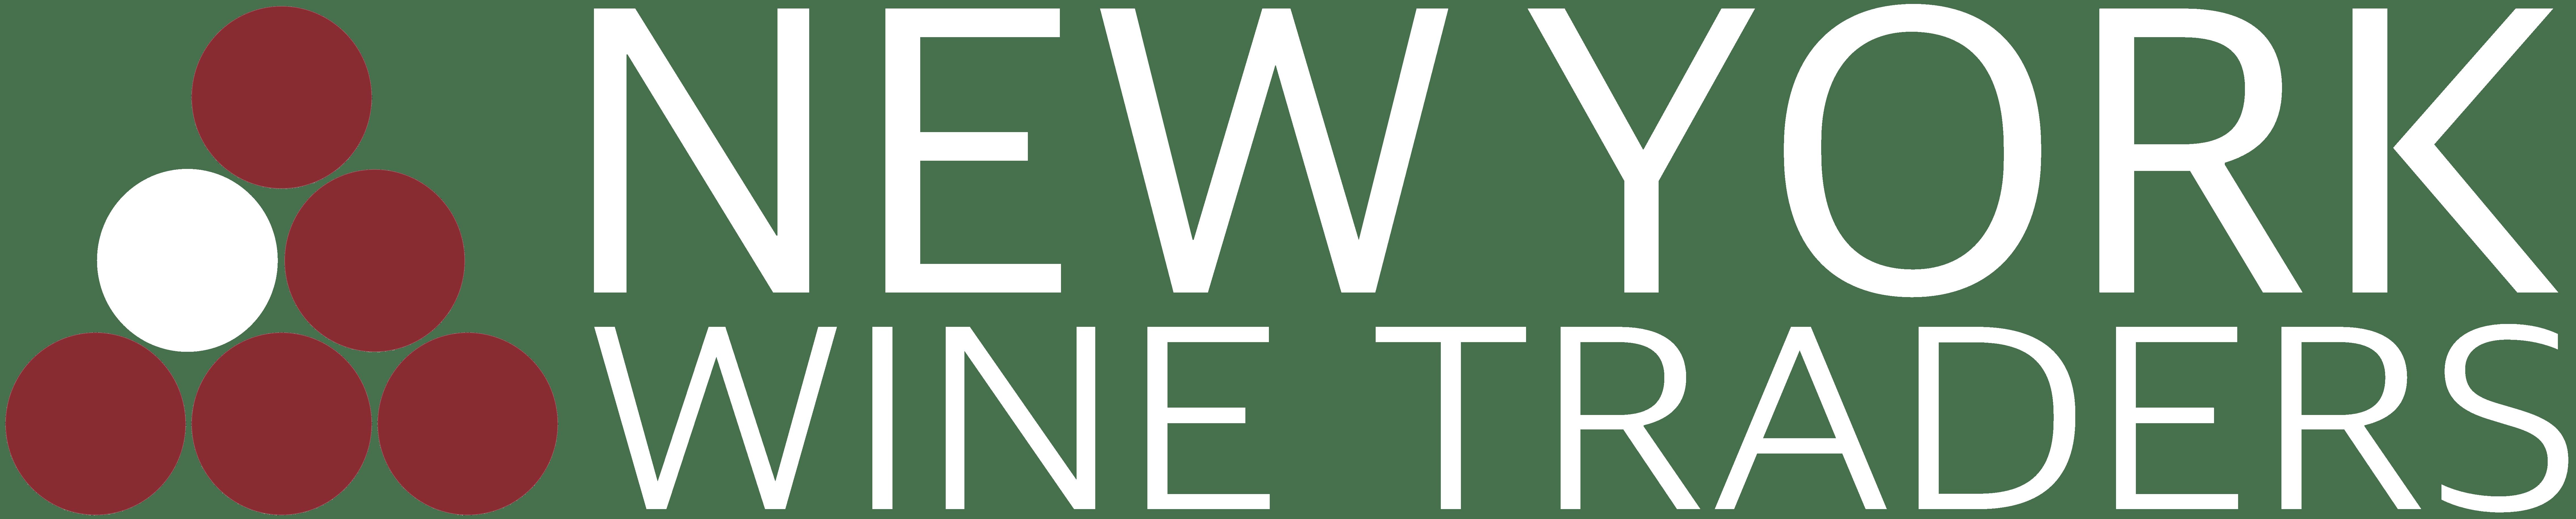 New York Wine Traders